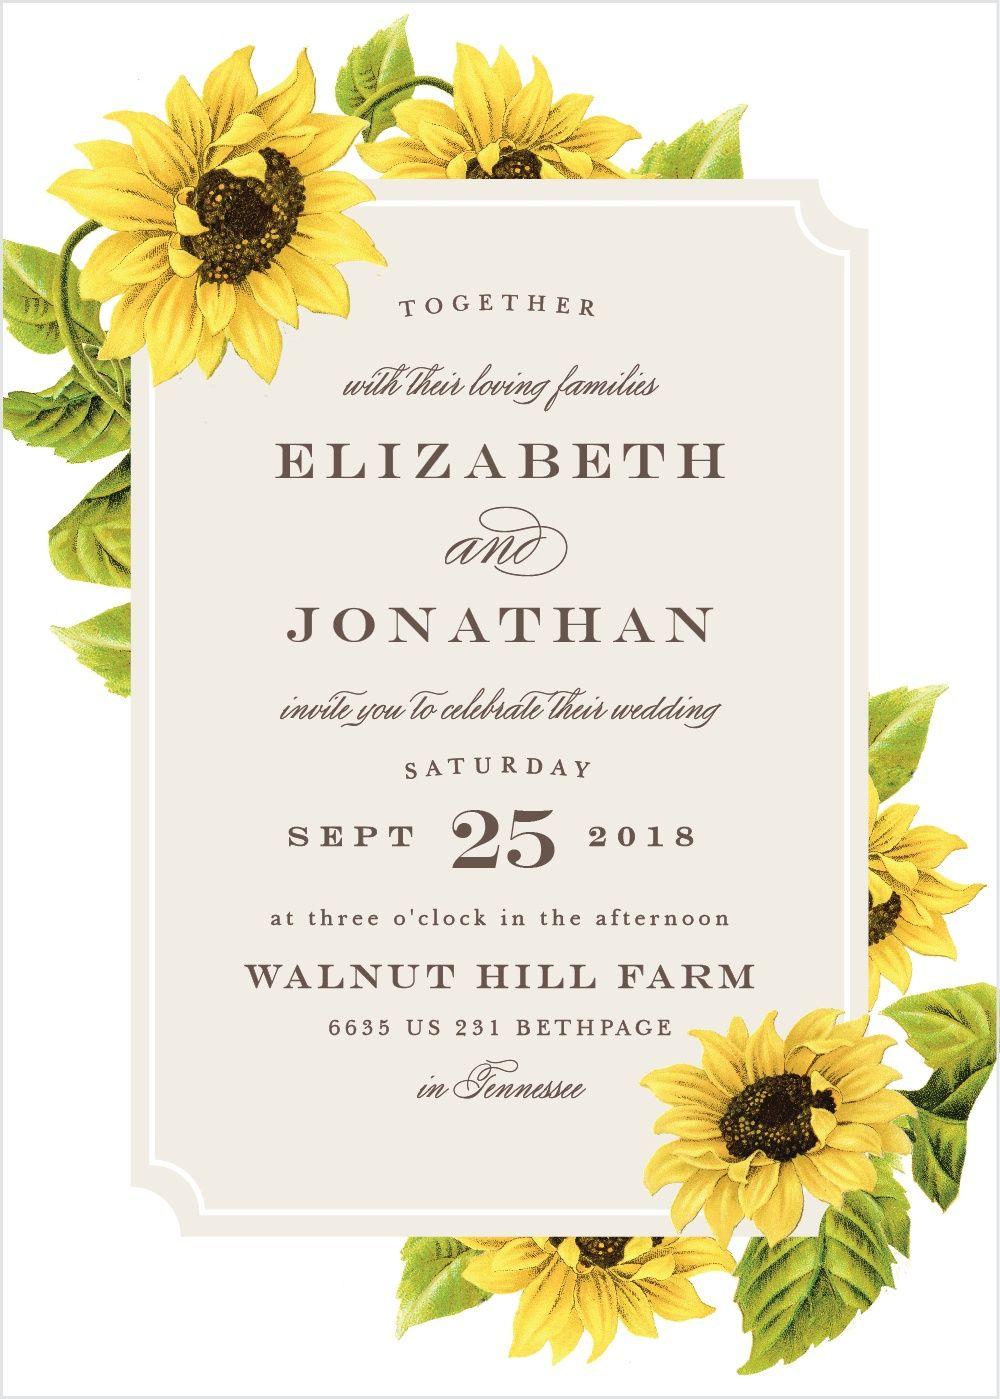 Sunflower Frame Wedding Invitations | Sunflowers, Weddings and ...